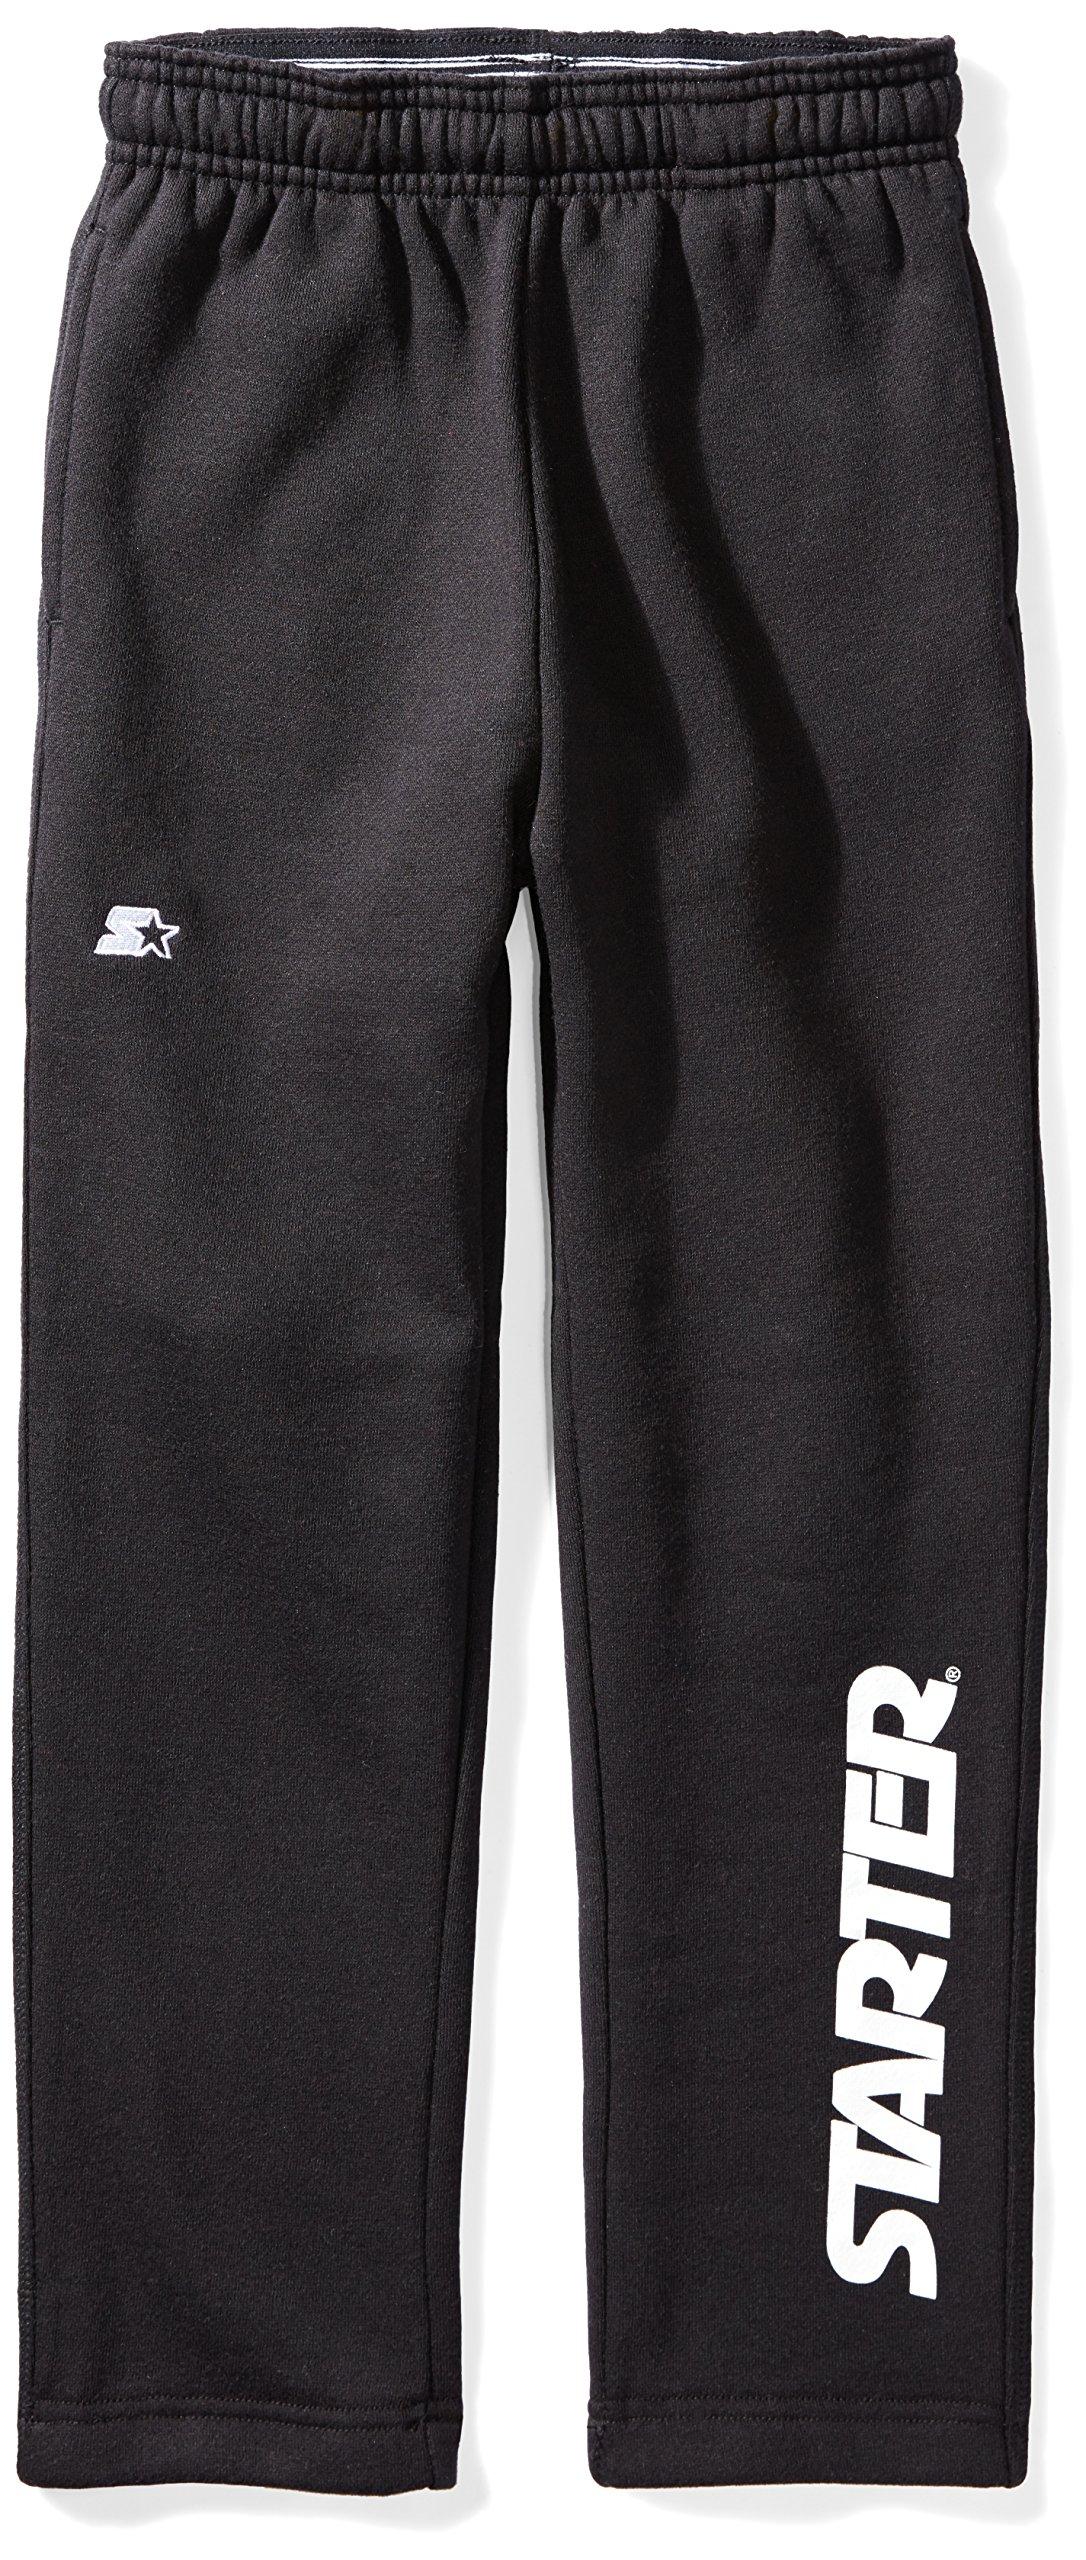 Starter Boys' Open-Bottom Logo Sweatpants with Pockets, Amazon Exclusive, Black with White Logo, M (8/10)